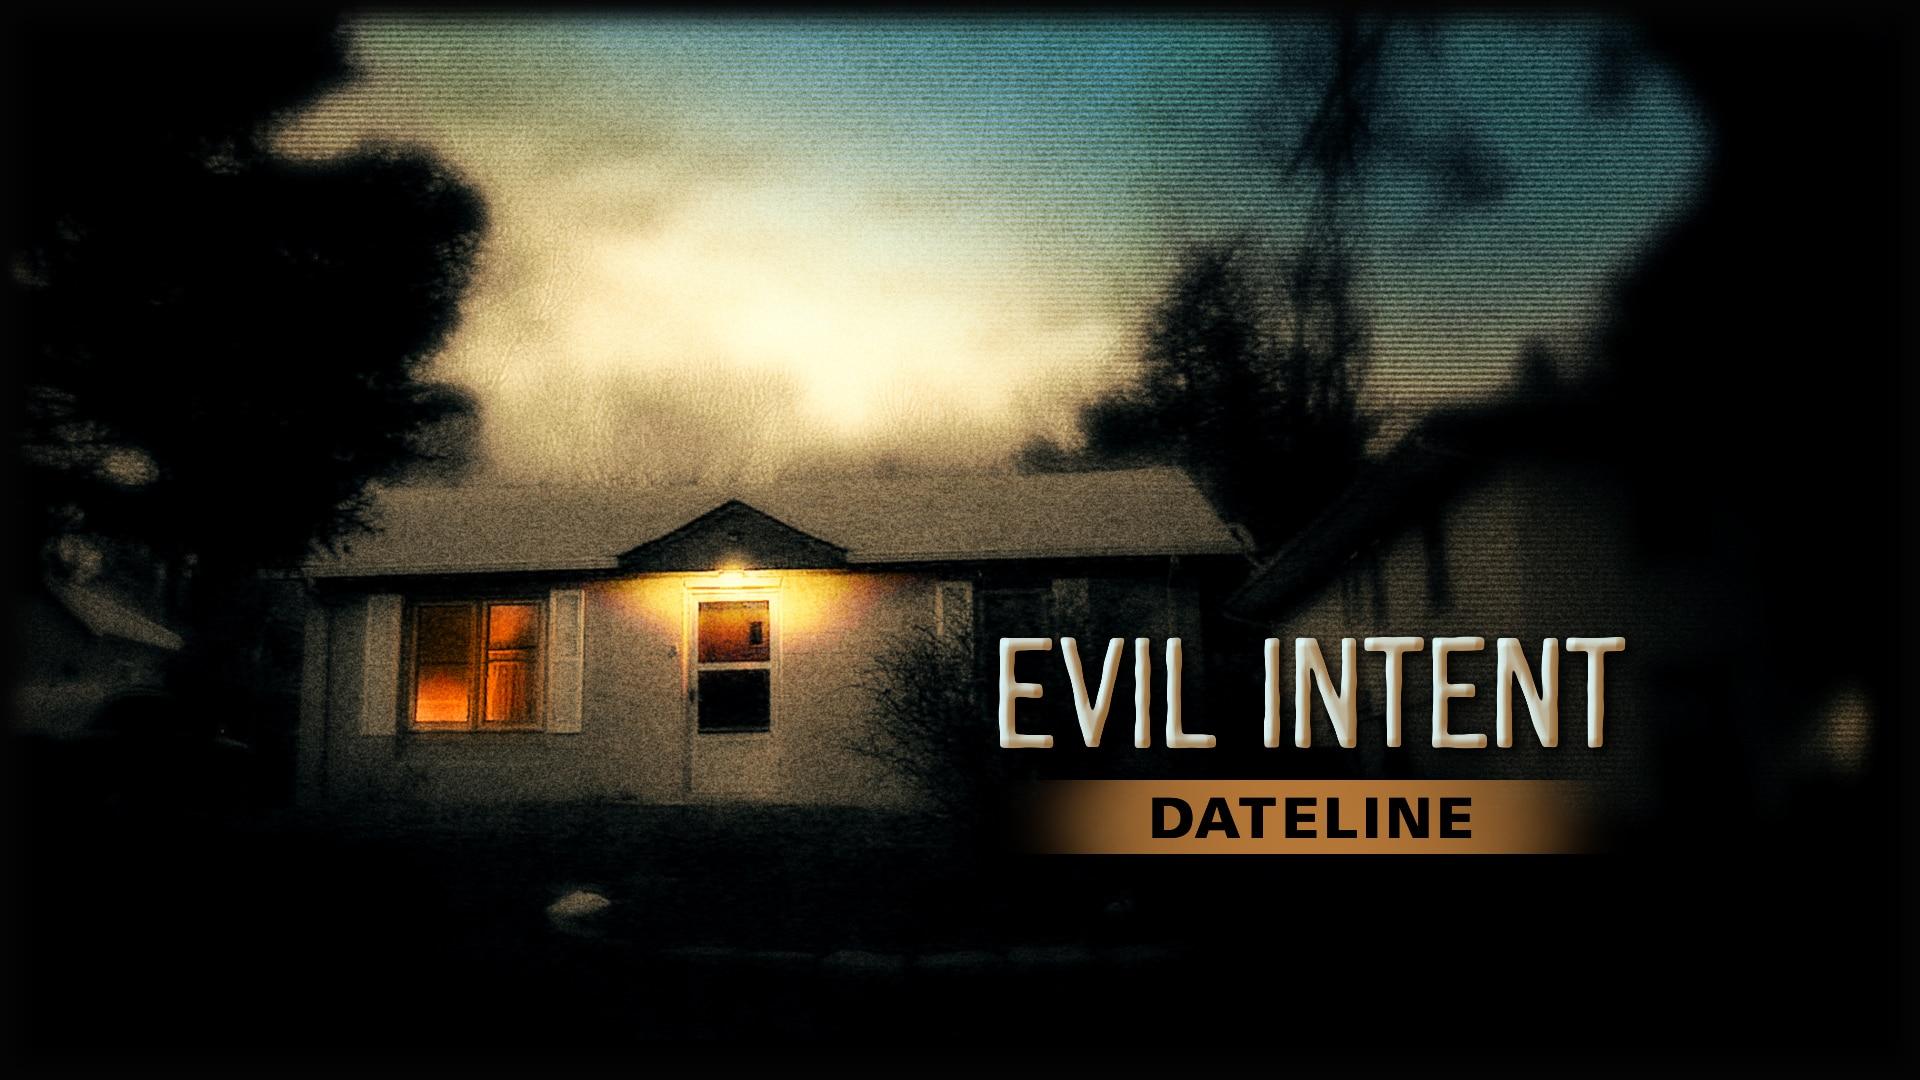 Watch Dateline Episode: Evil Intent